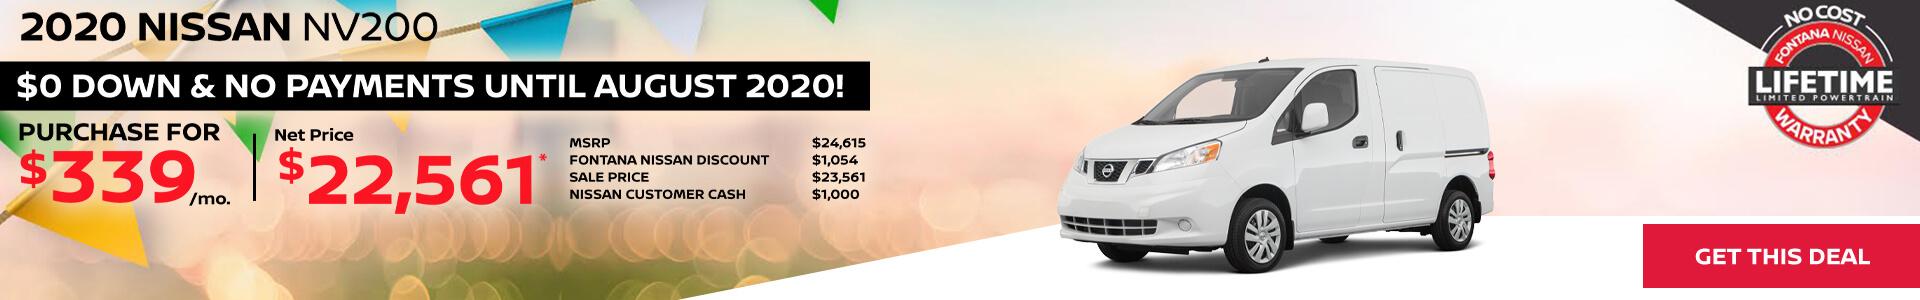 Nissan NV200 $339